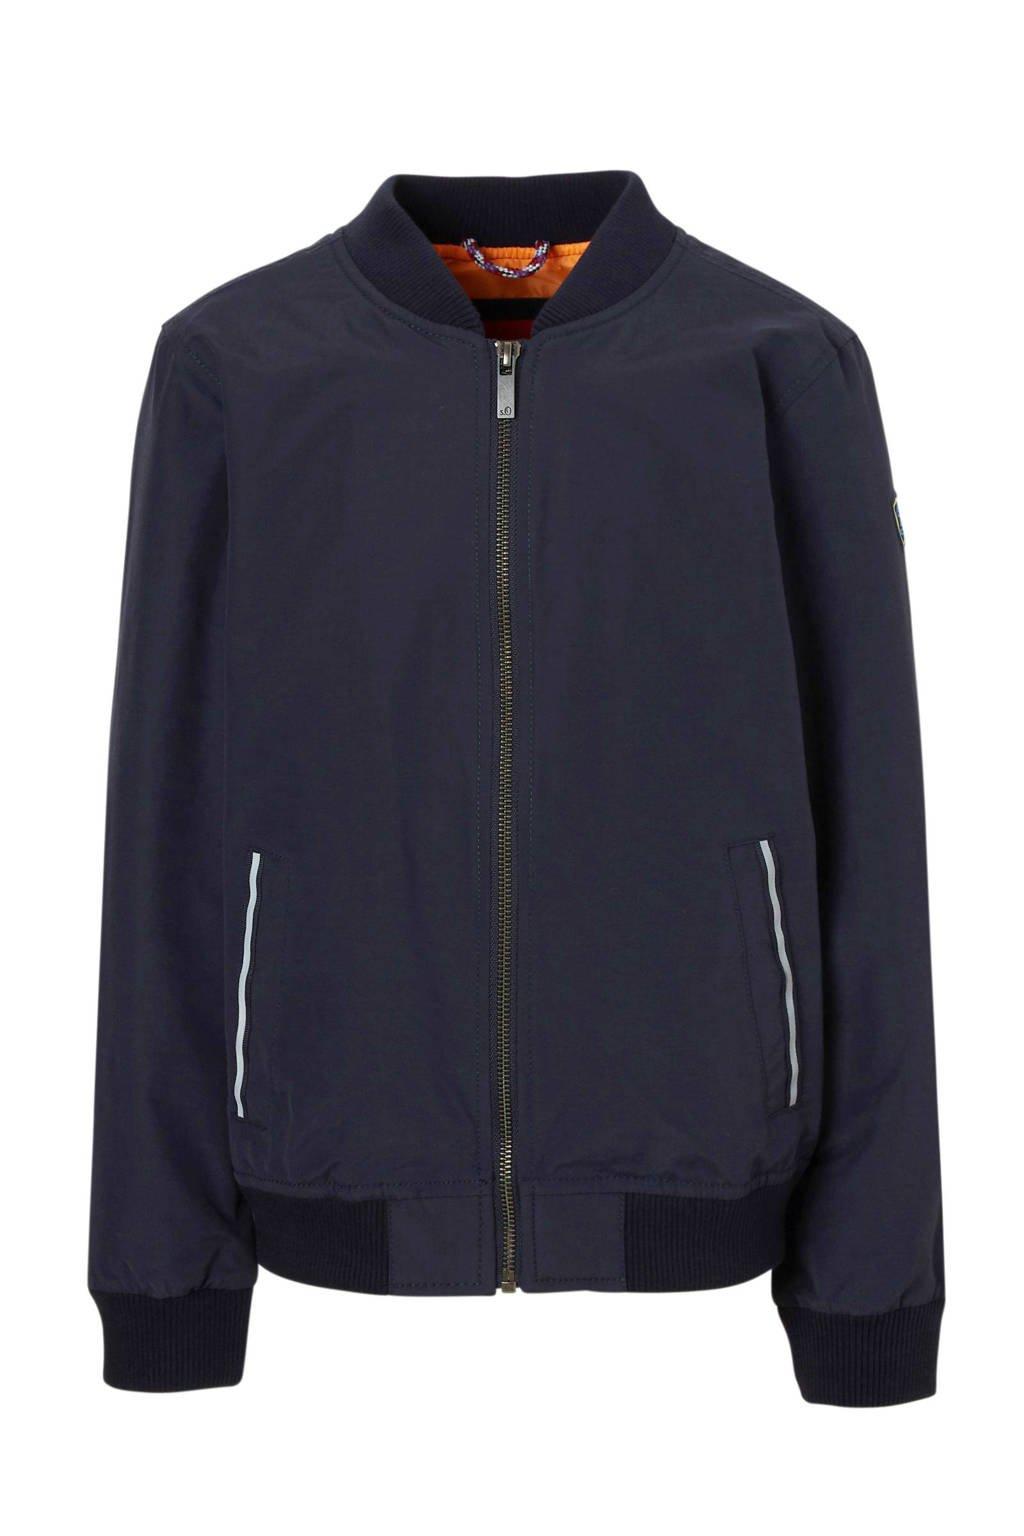 s.Oliver jas in bombermodel donkerblauw, Donkerblauw